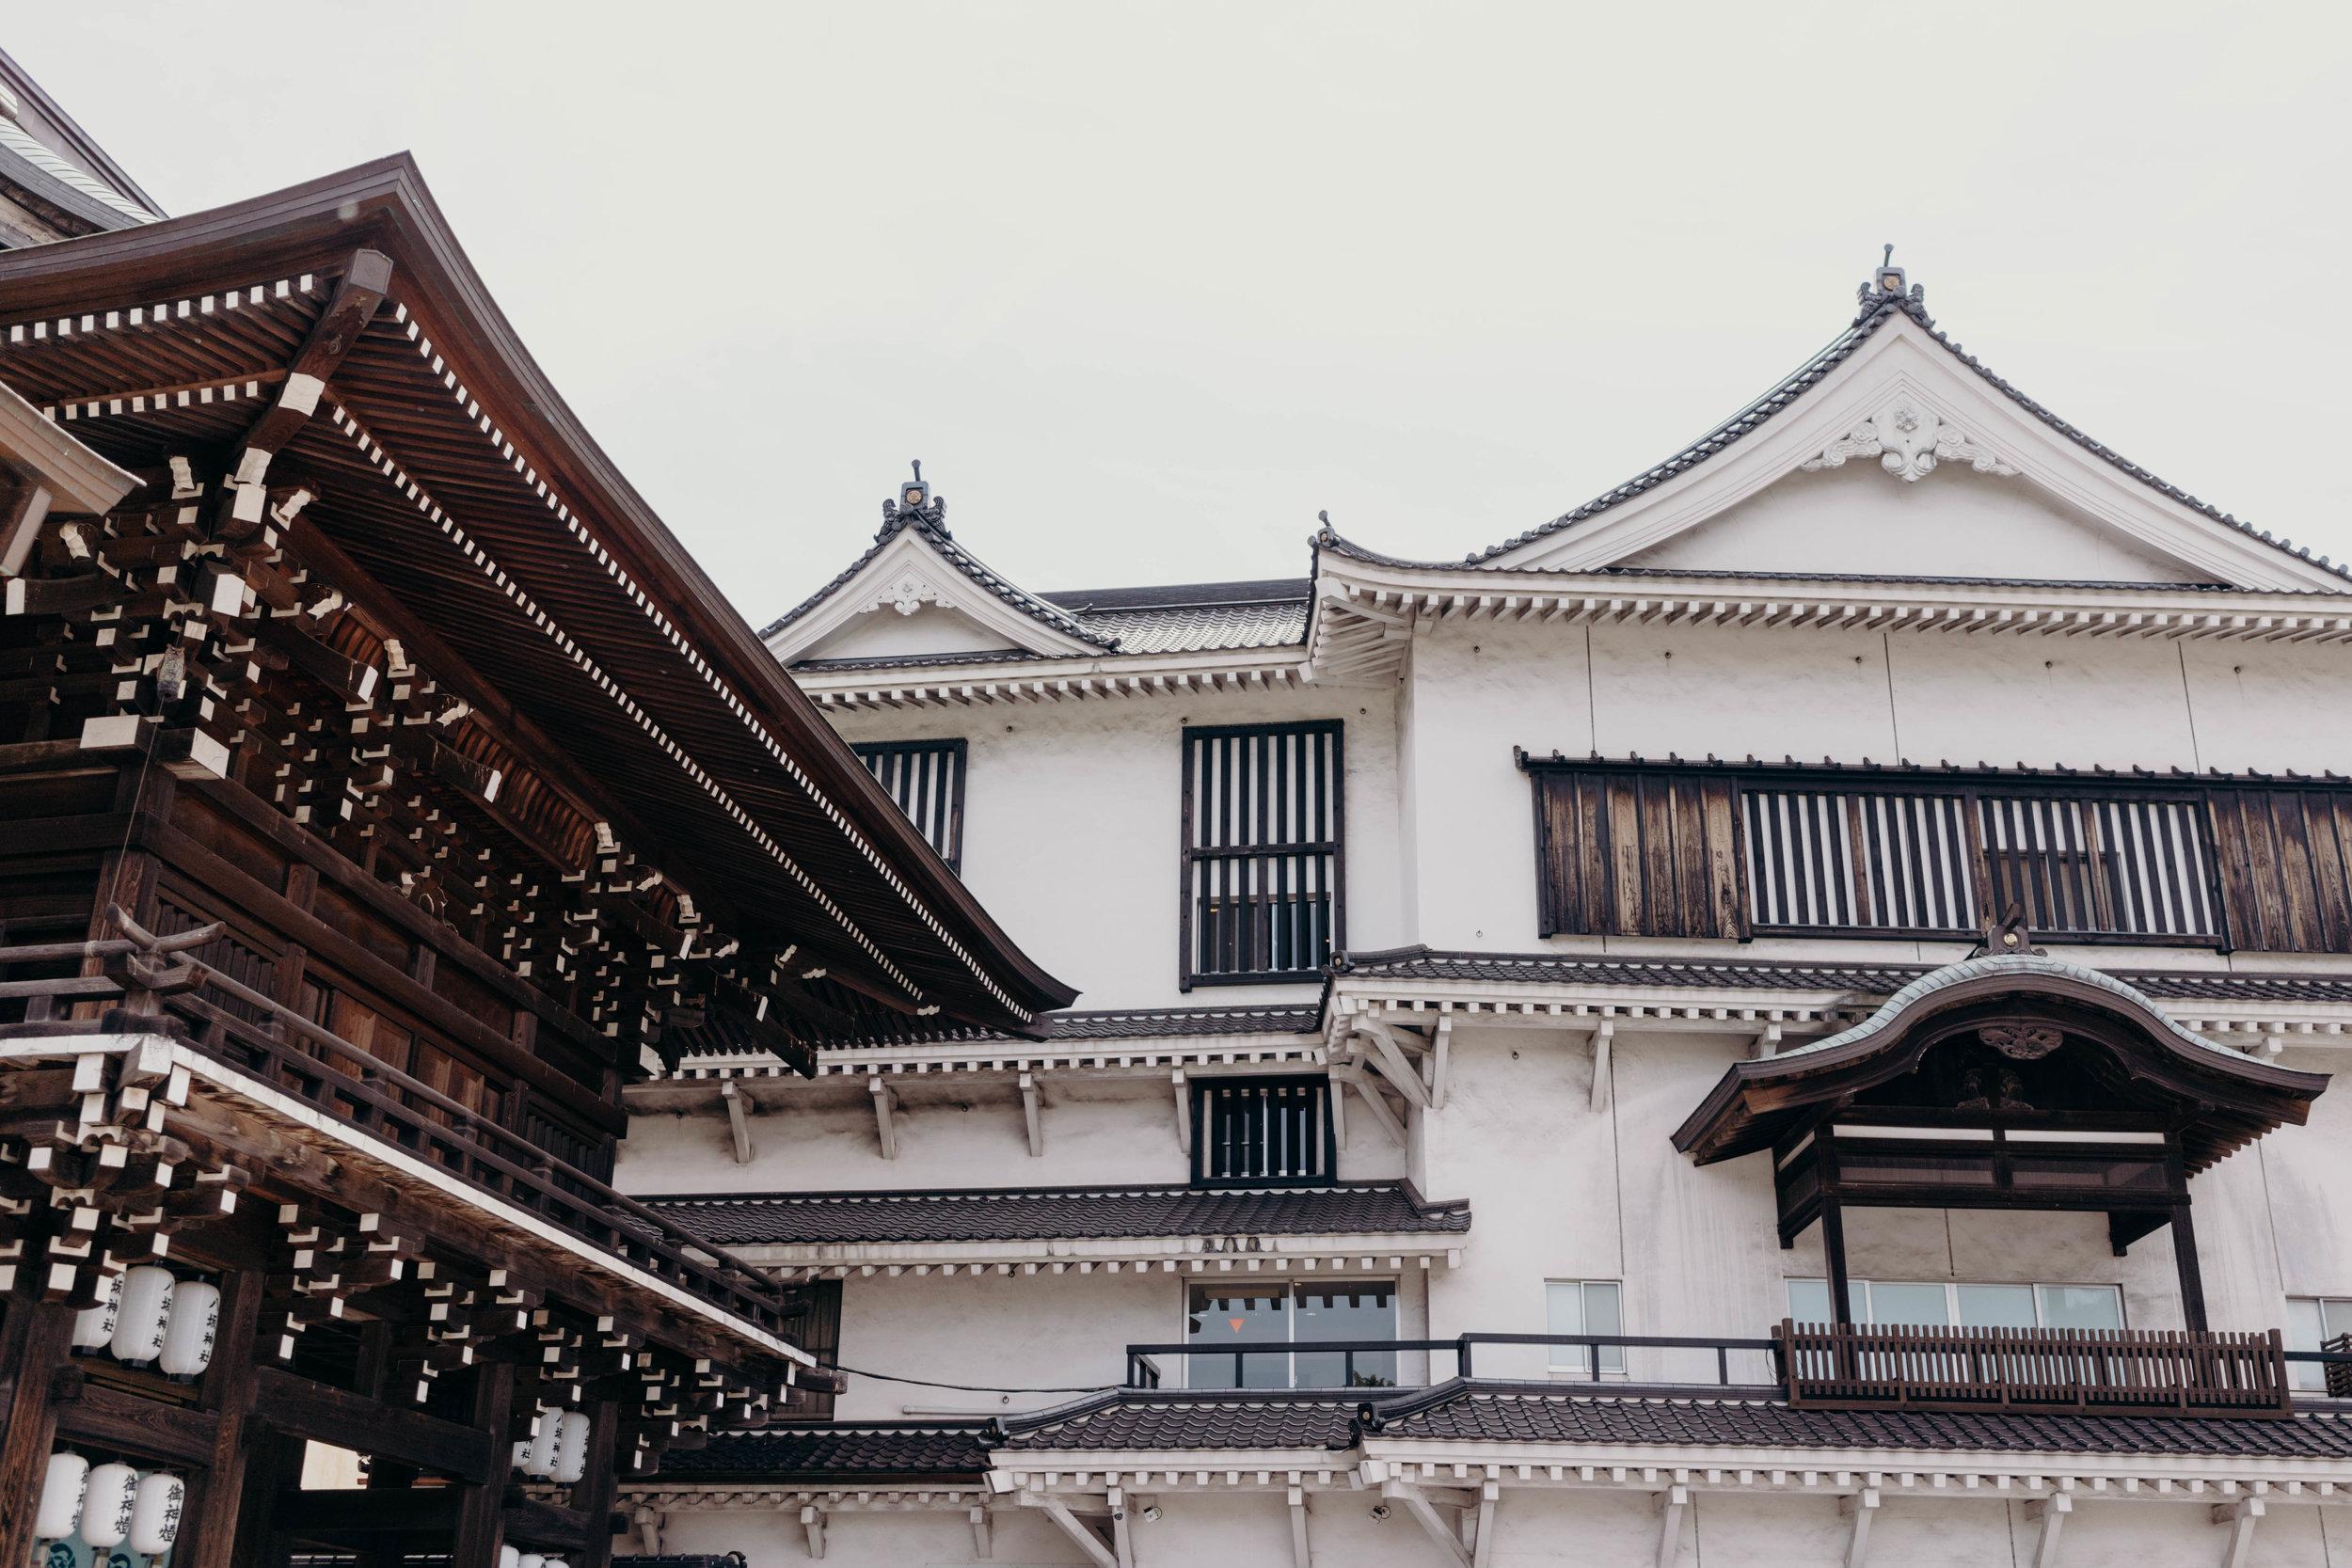 A Weekend in Kitakyushu, Japan | On the Street Where We Live ( aretherelilactrees.com )  Kokura Castle